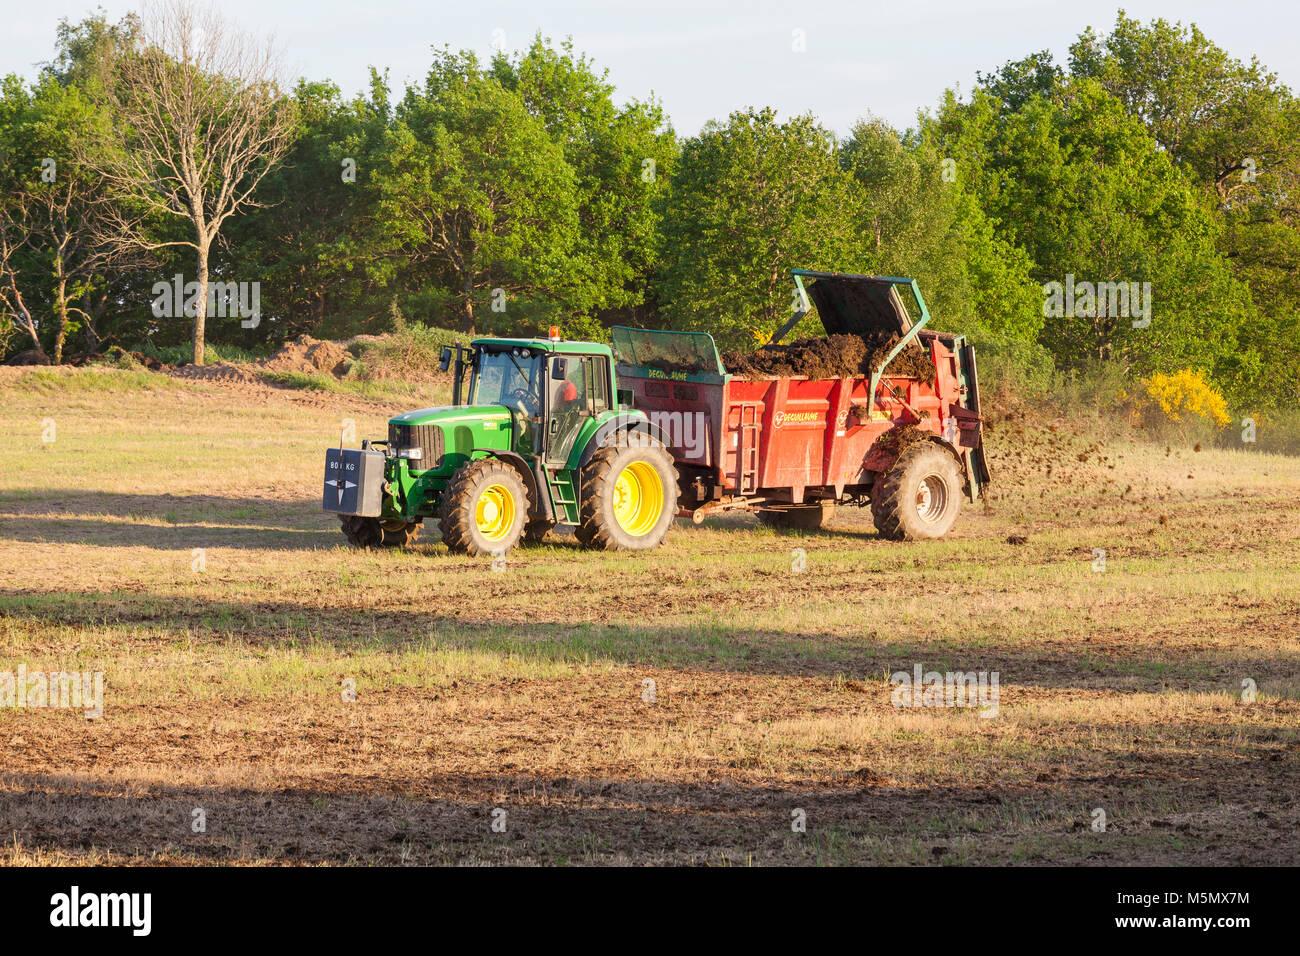 Farmer spreading organic fertiliser, fertilizer  or manure on a spring pasture using a Degullaume muck spreader - Stock Image